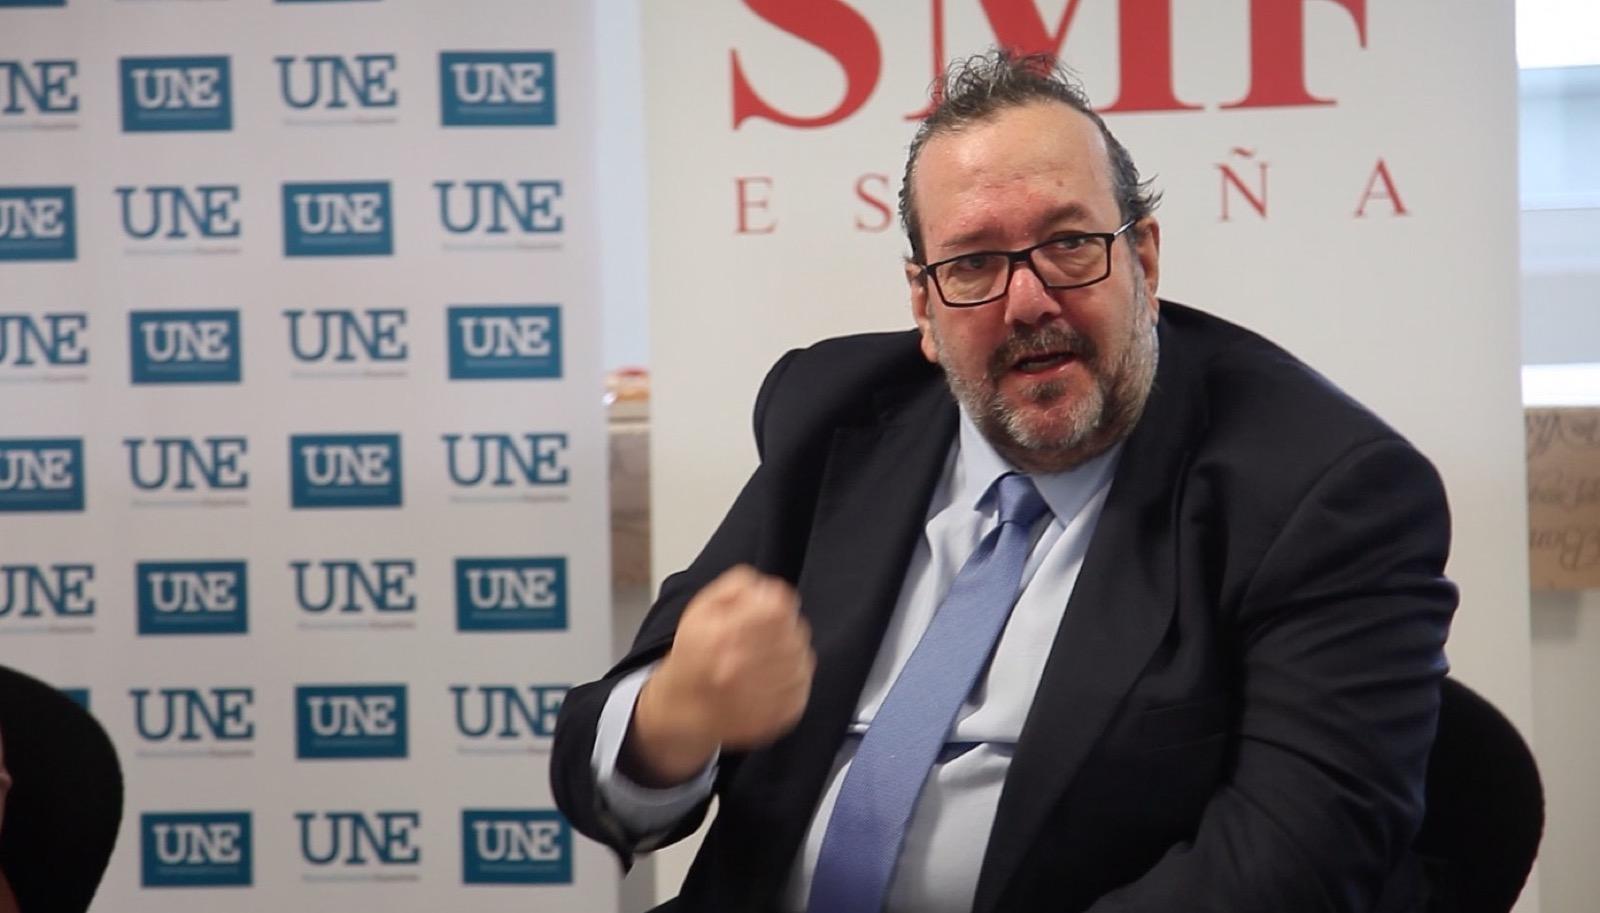 Javier Peris, Vicepresidente Ejecutivo de itSMF